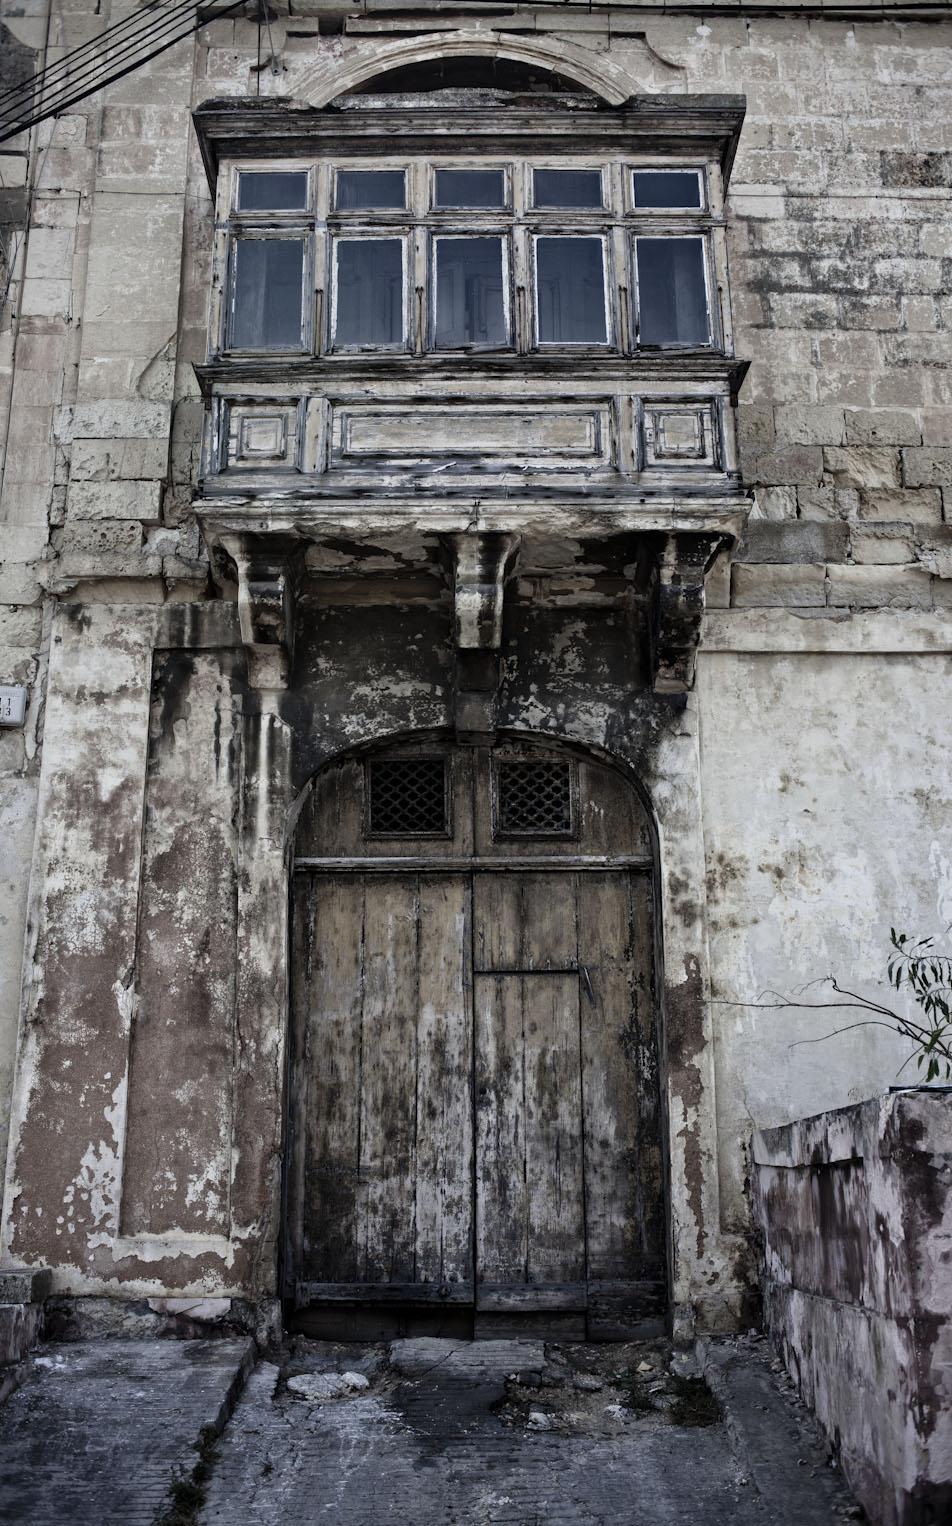 Wabi sabi Doors and facades, with traditional Maltese balcony, Msida, Malta ©Helen Jones-Florio